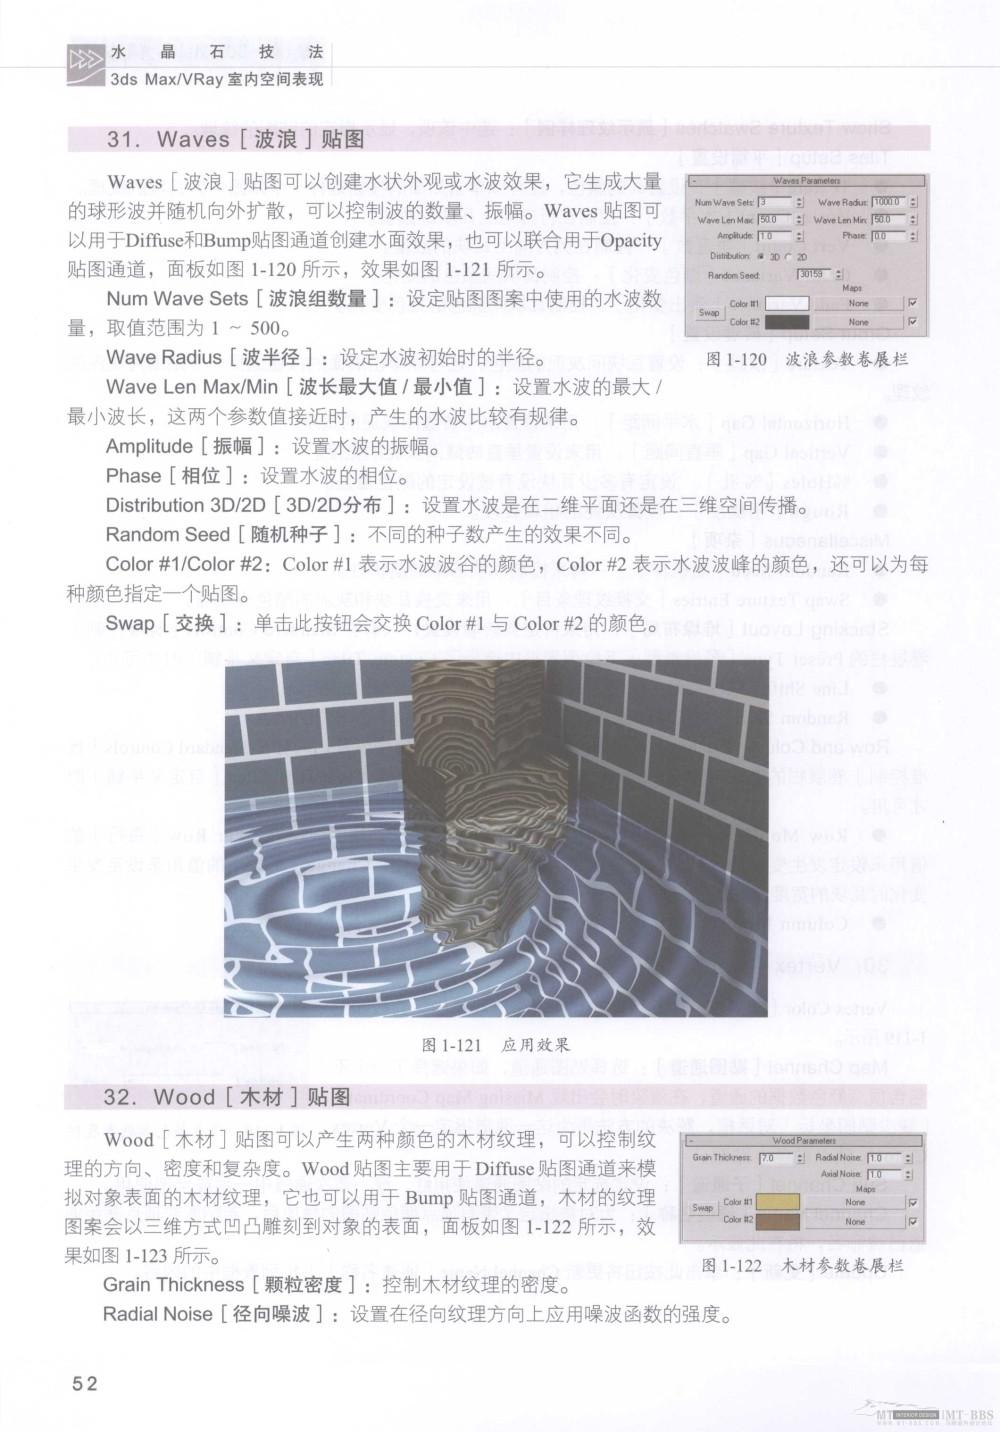 水晶石技法-3ds_Max&VRay室内空间表现_水晶石技法-3ds_Max&VRay室内空间表现_页面_058.jpg